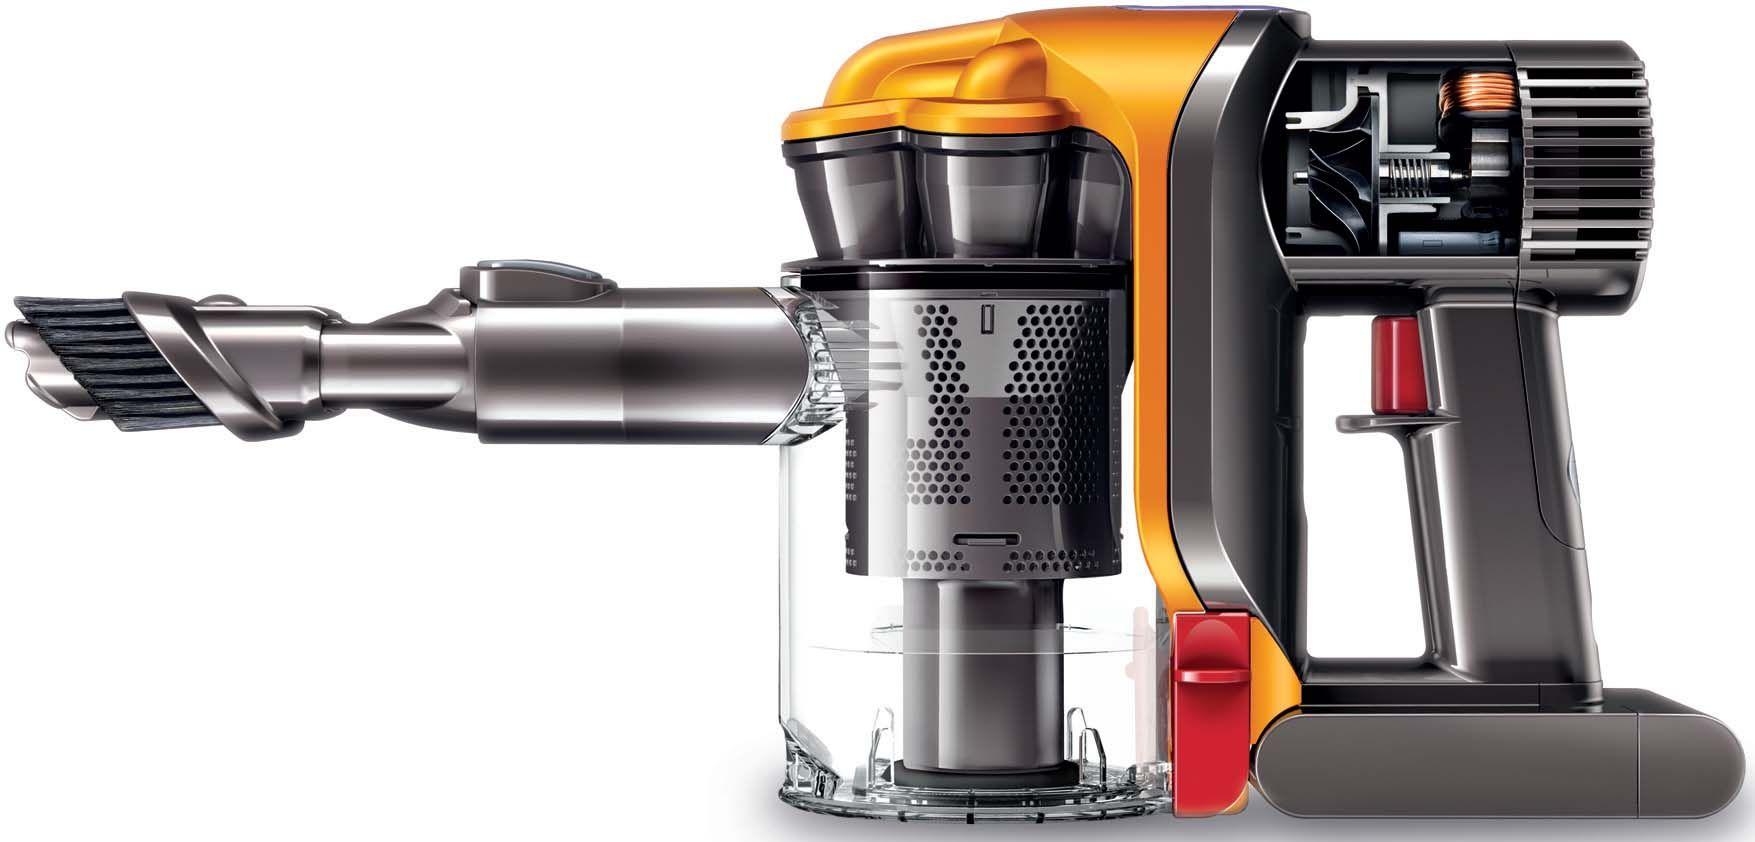 Dyson Handheld Vacuum CleanerHousework Dyson handheld